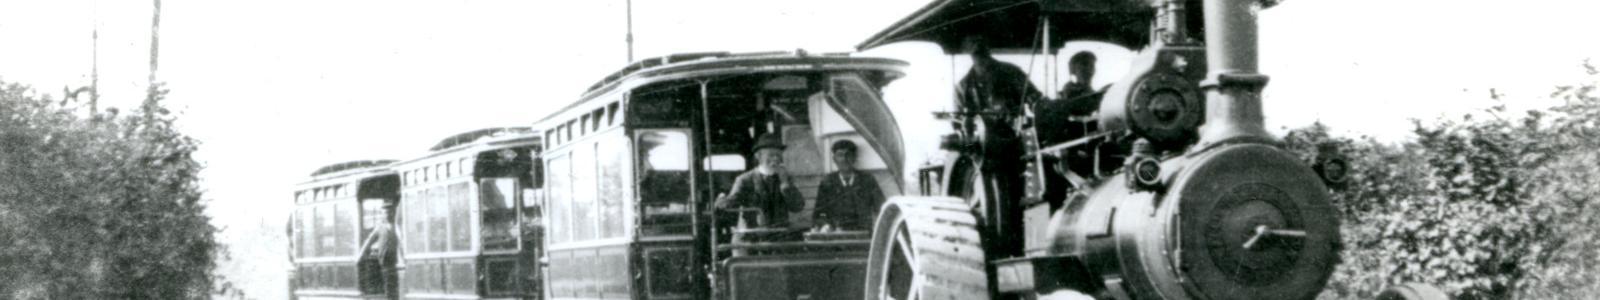 Transport photographs